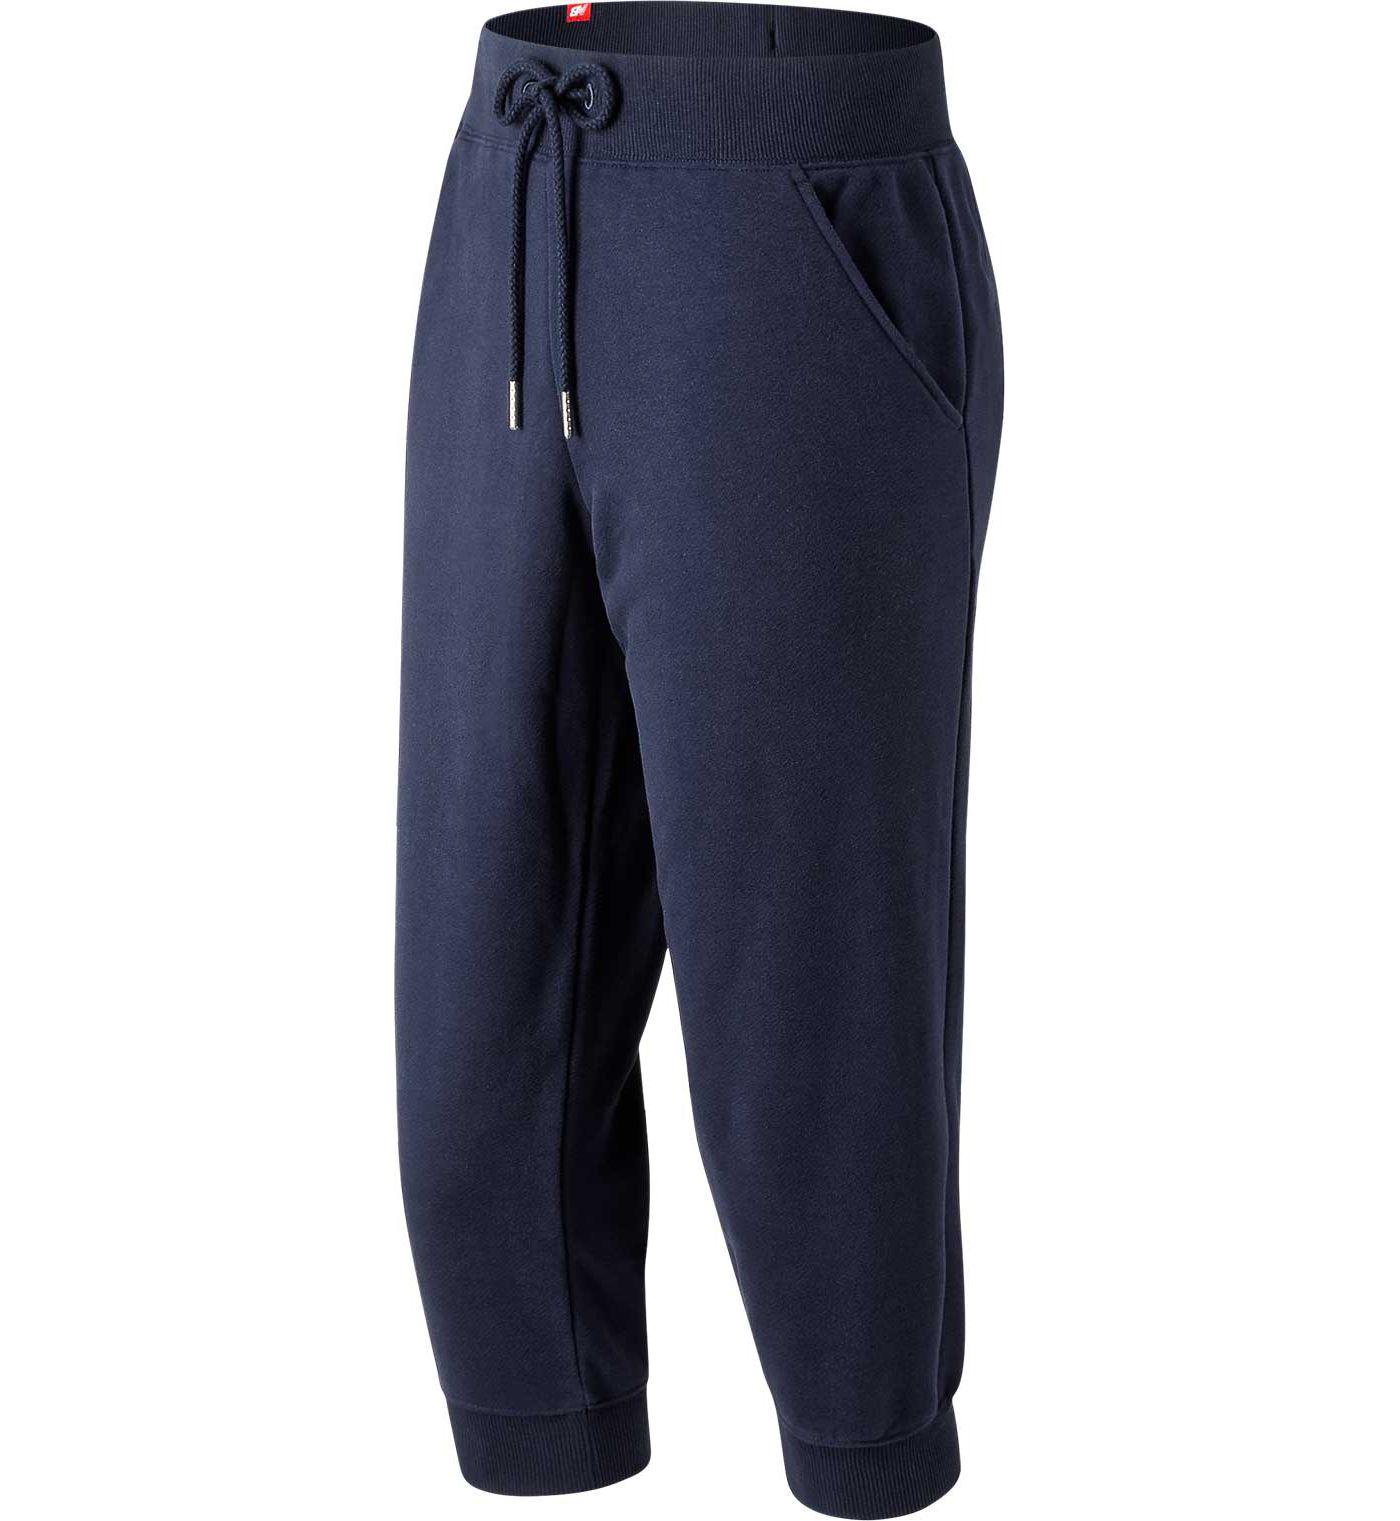 New Balance Women's Essentials 90s 3QTR FT Pant